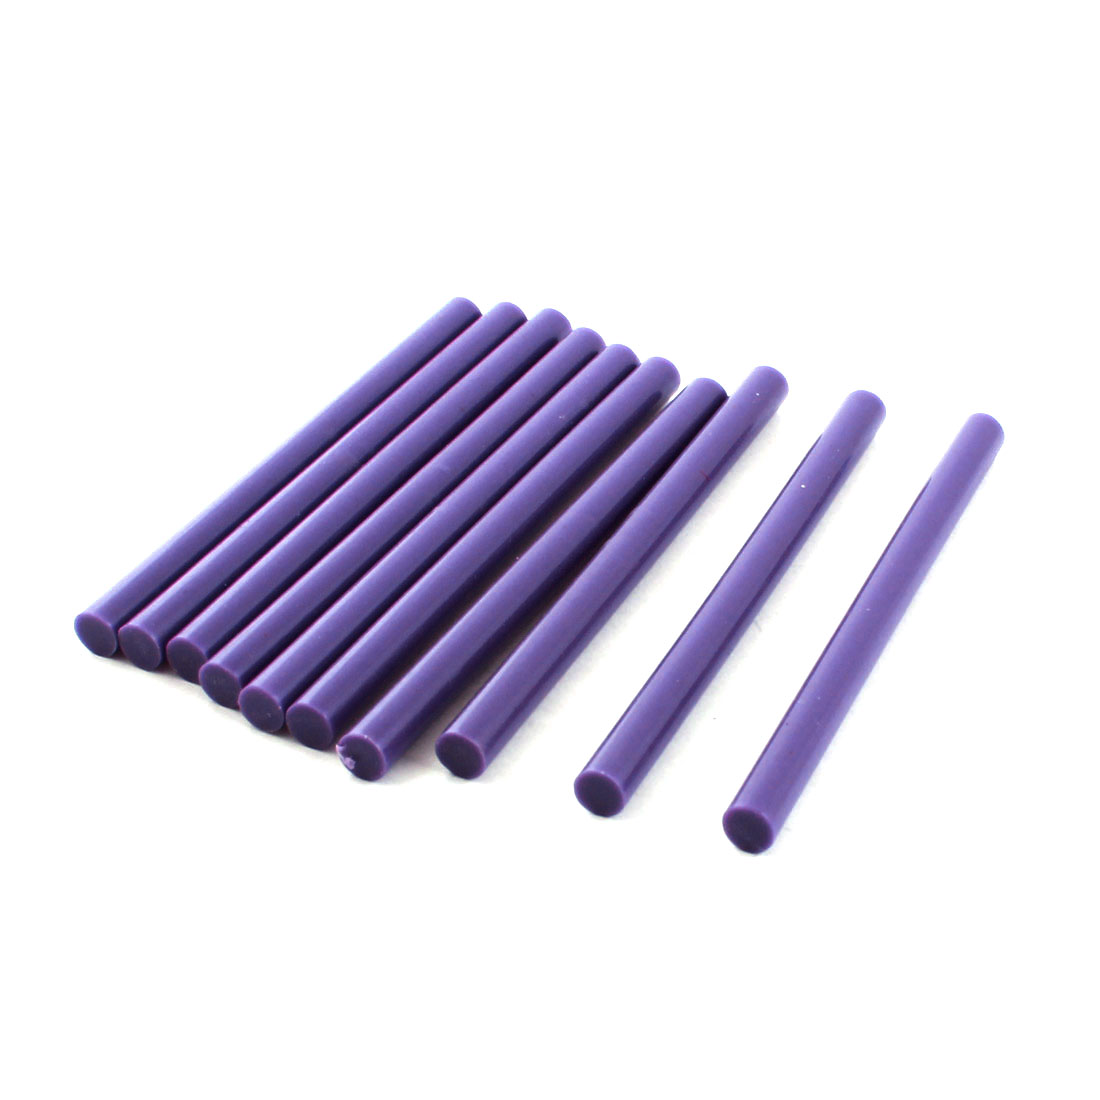 10 Pcs Purple Hot Melt Glue Gun Adhesive Sticks 7mm x 100mm for Arts Crafting